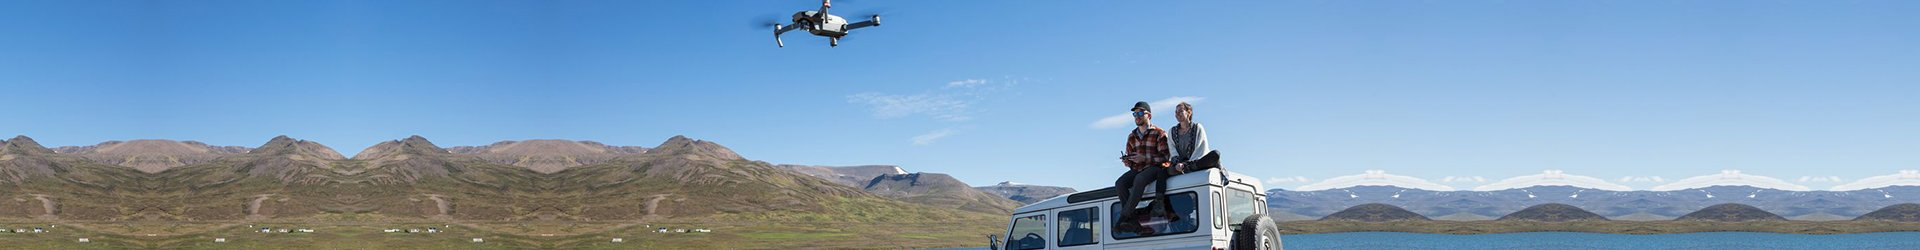 accesorios drone